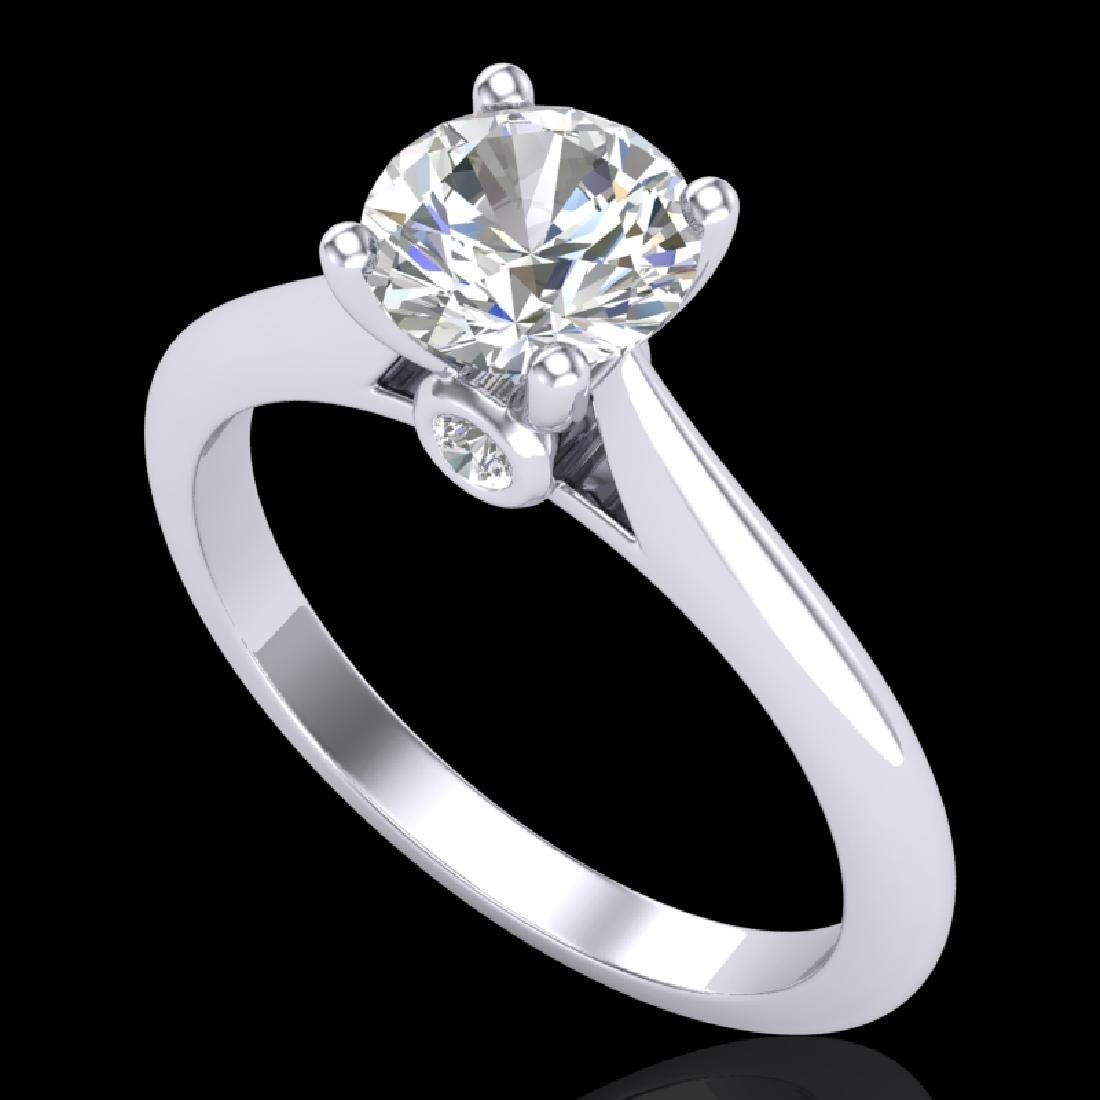 1.08 CTW VS/SI Diamond Solitaire Art Deco Ring 18K